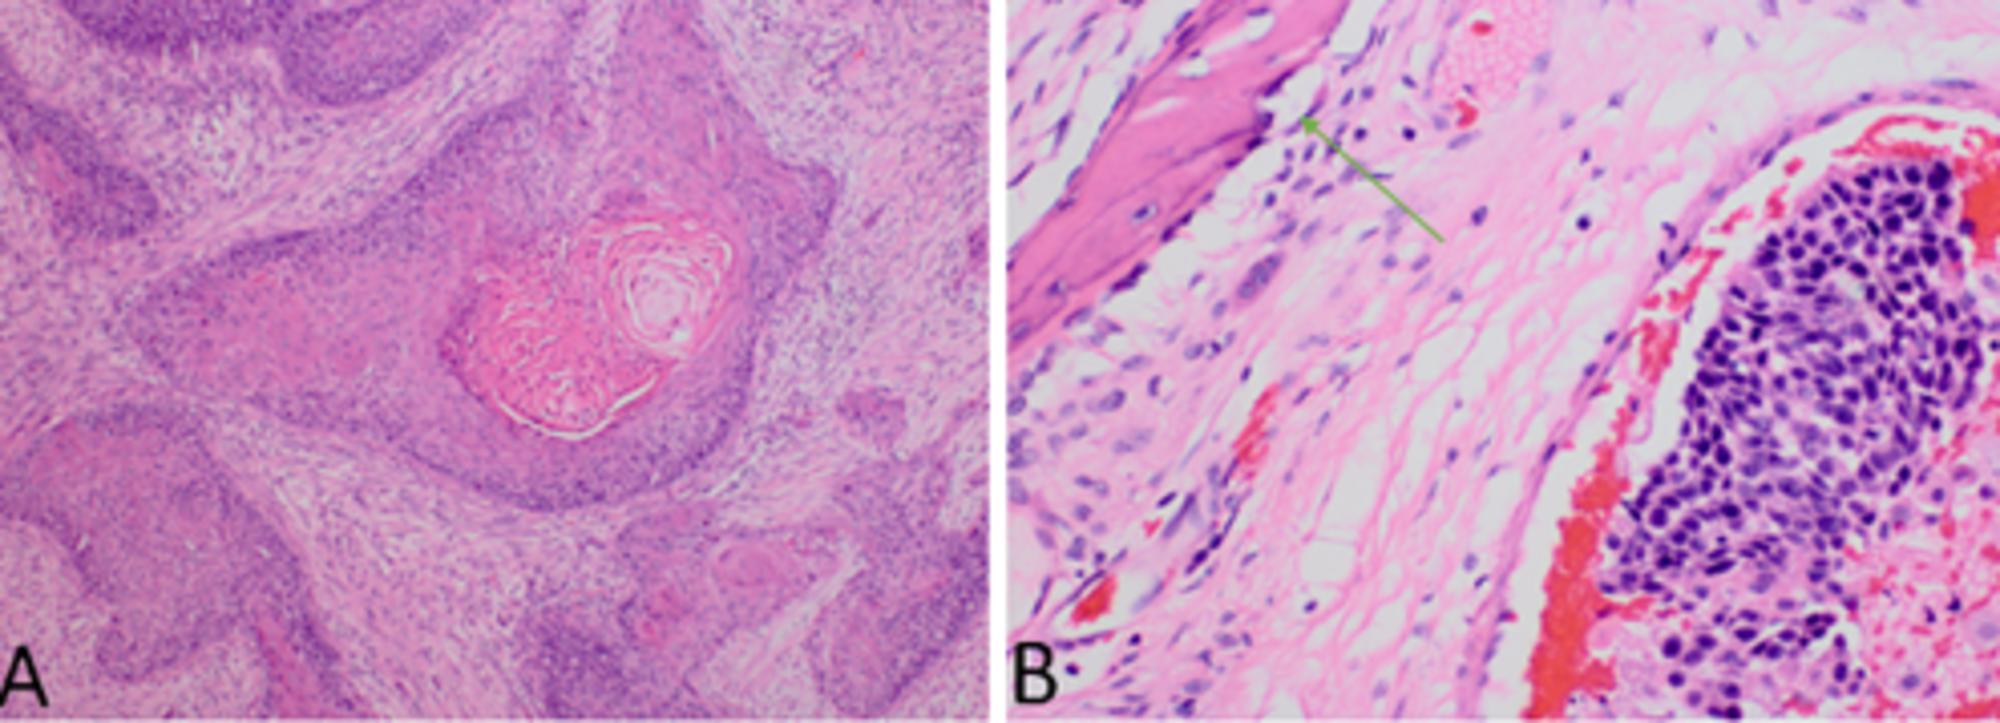 squamous cell carcinoma sinonasal papilloma